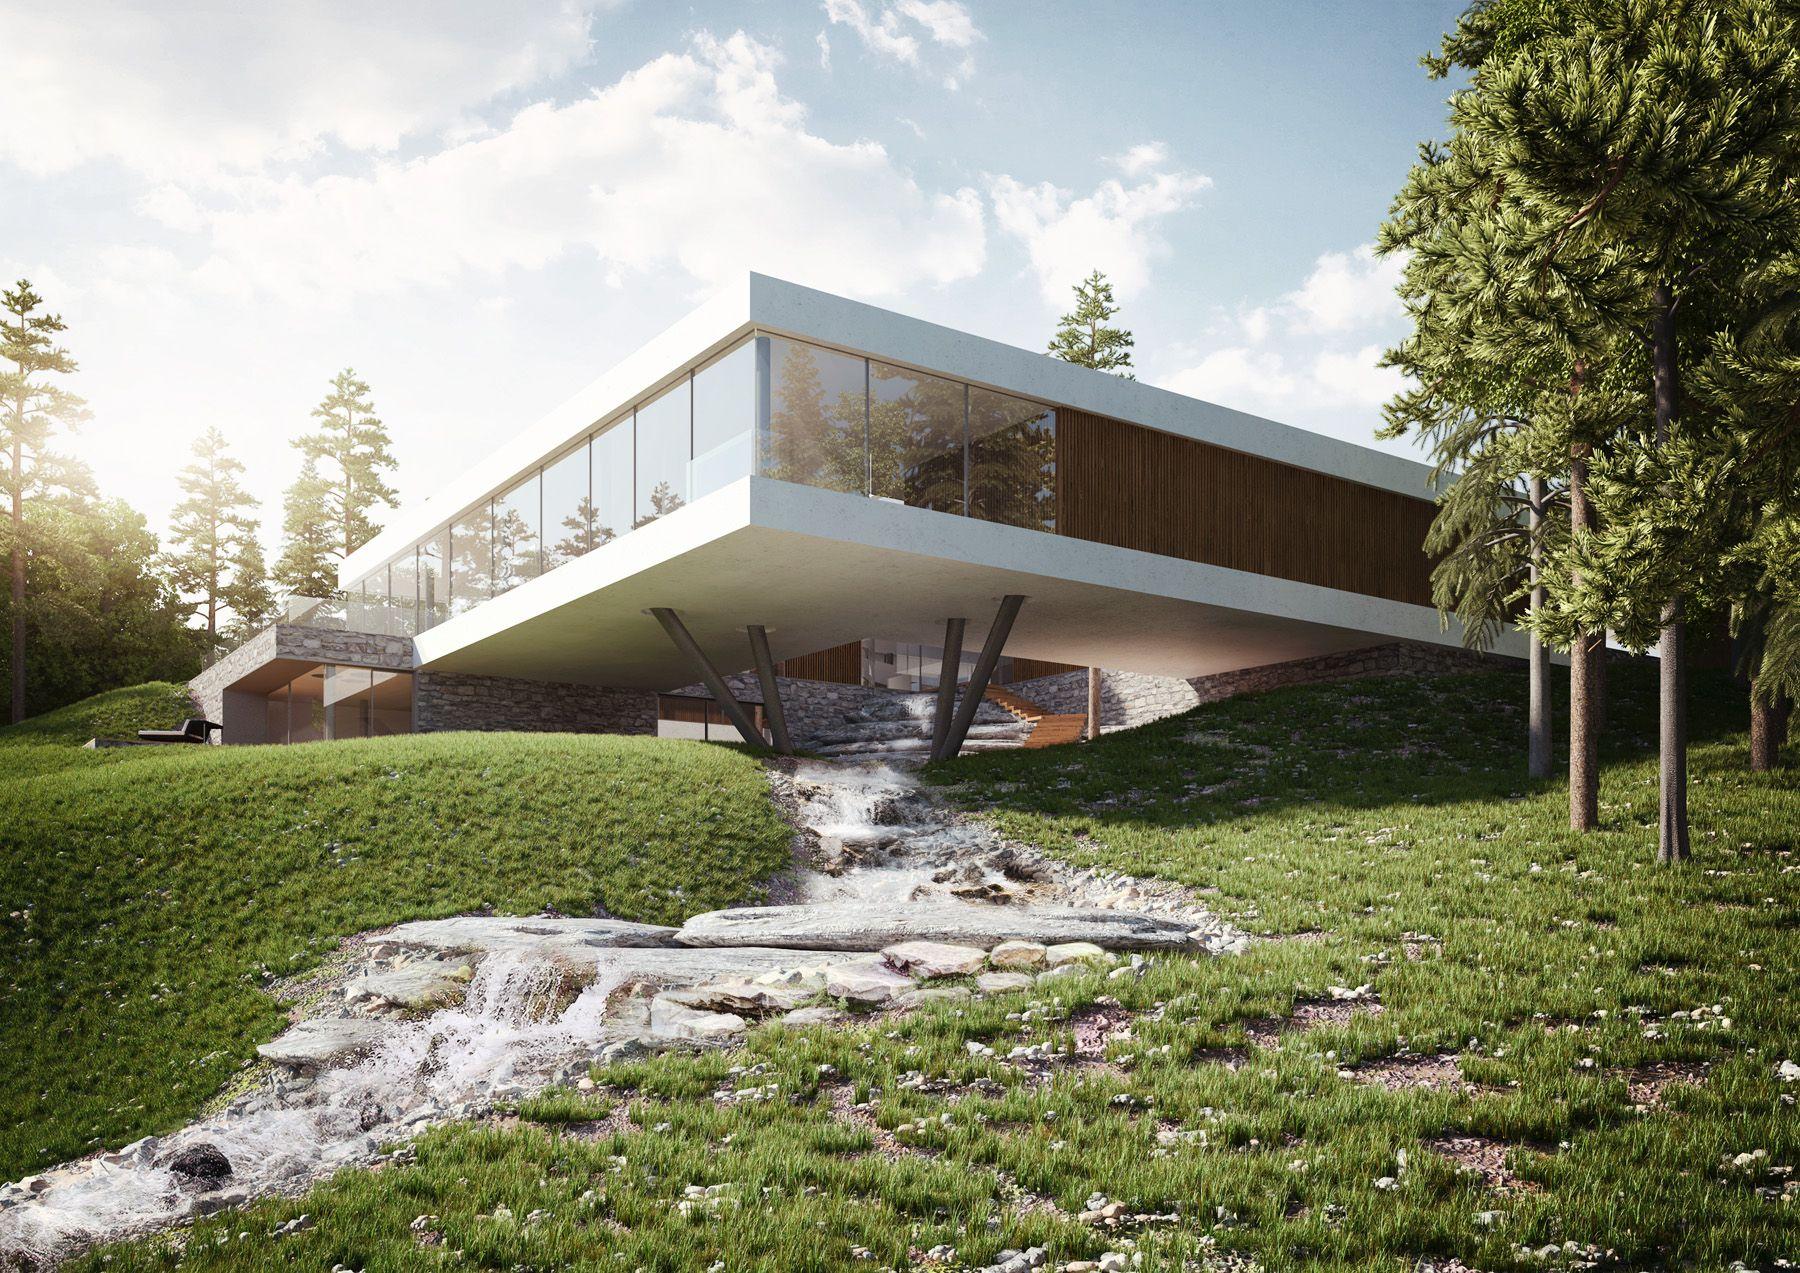 Charming Home Design Zlín Part - 7: 01 Privat Villa In Zlin. 1800 X 1273 (